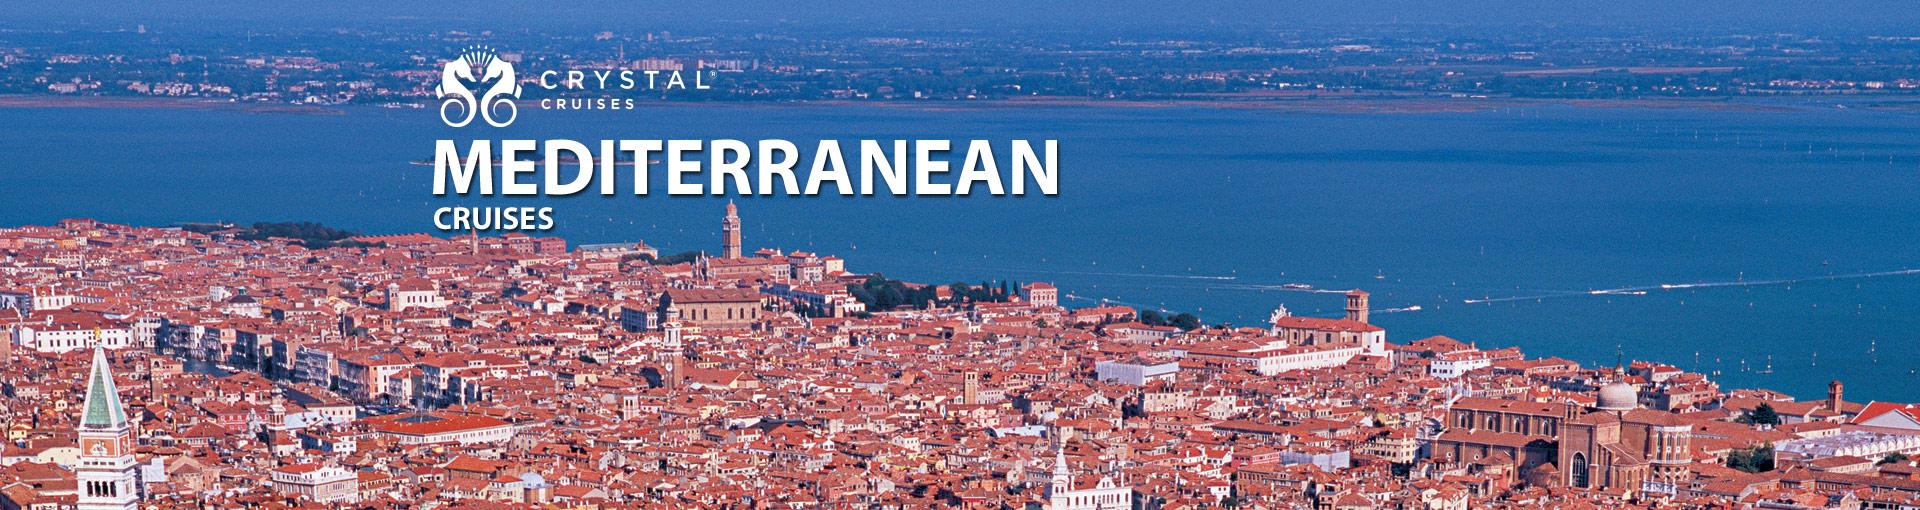 Crystal Cruises Mediterranean Cruises